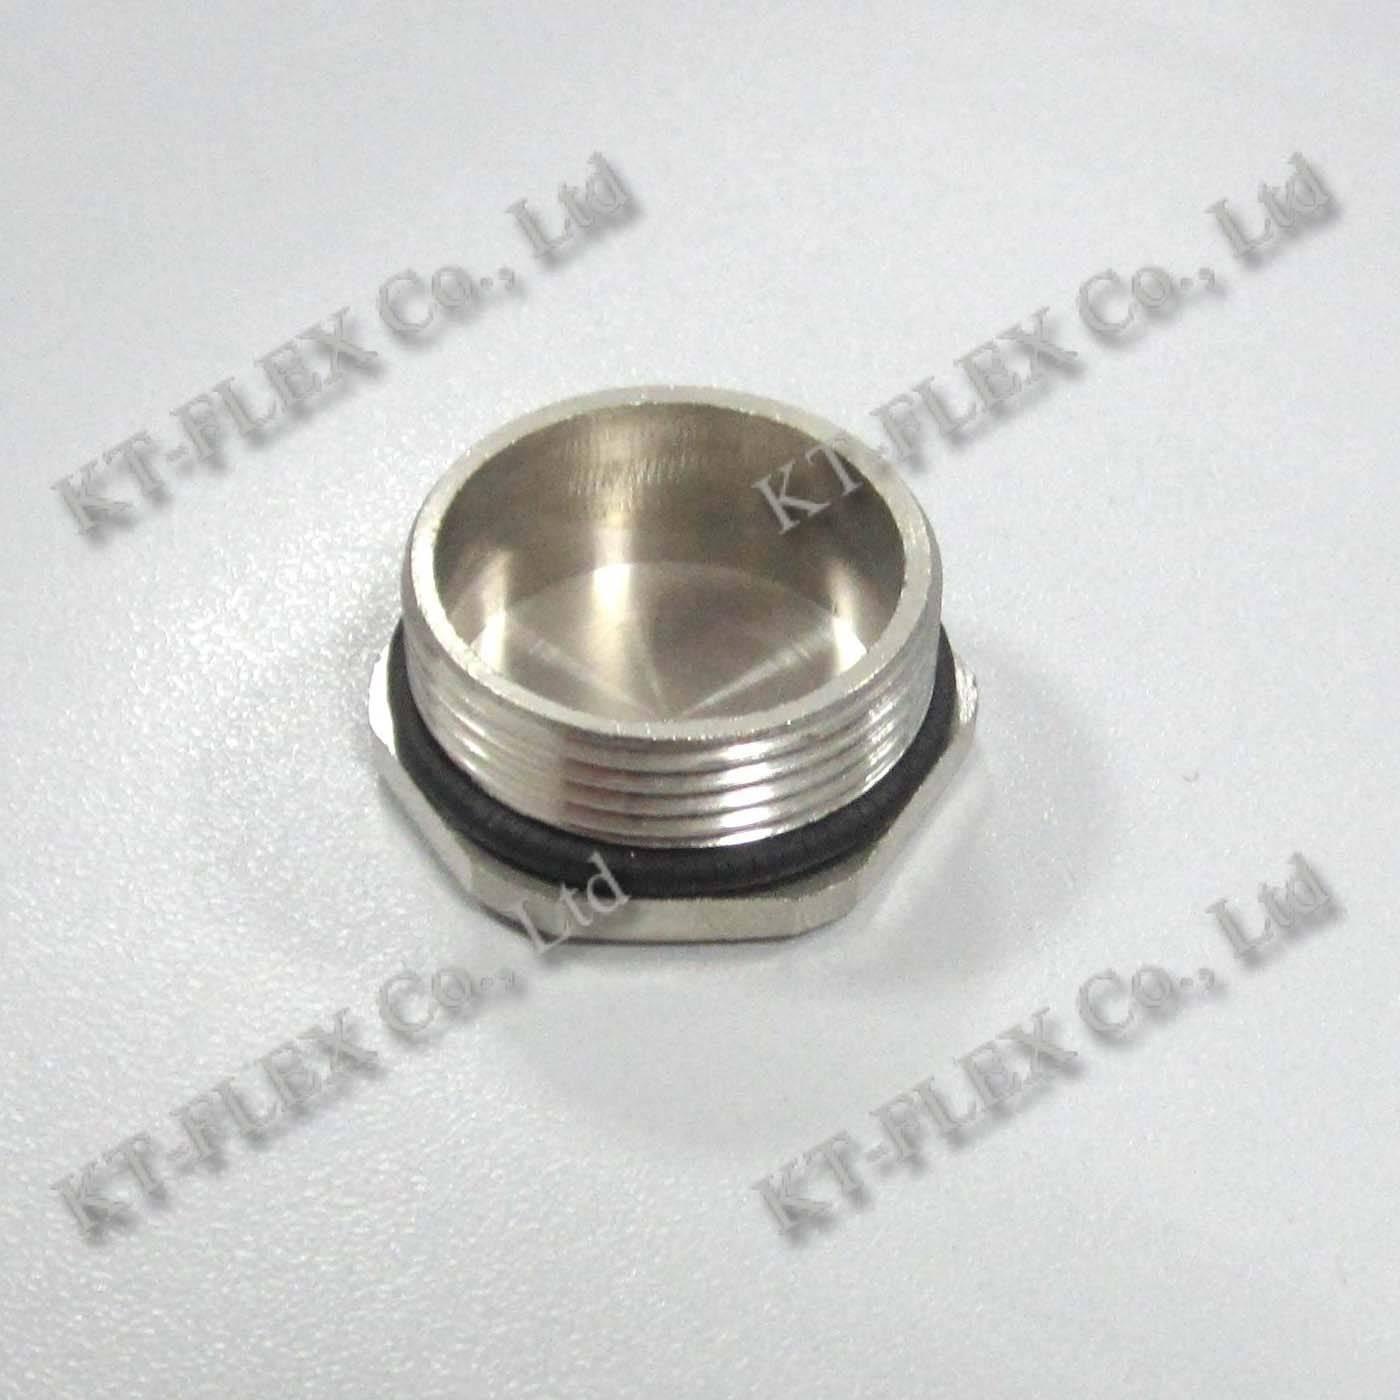 M25 Brass Hex Plug